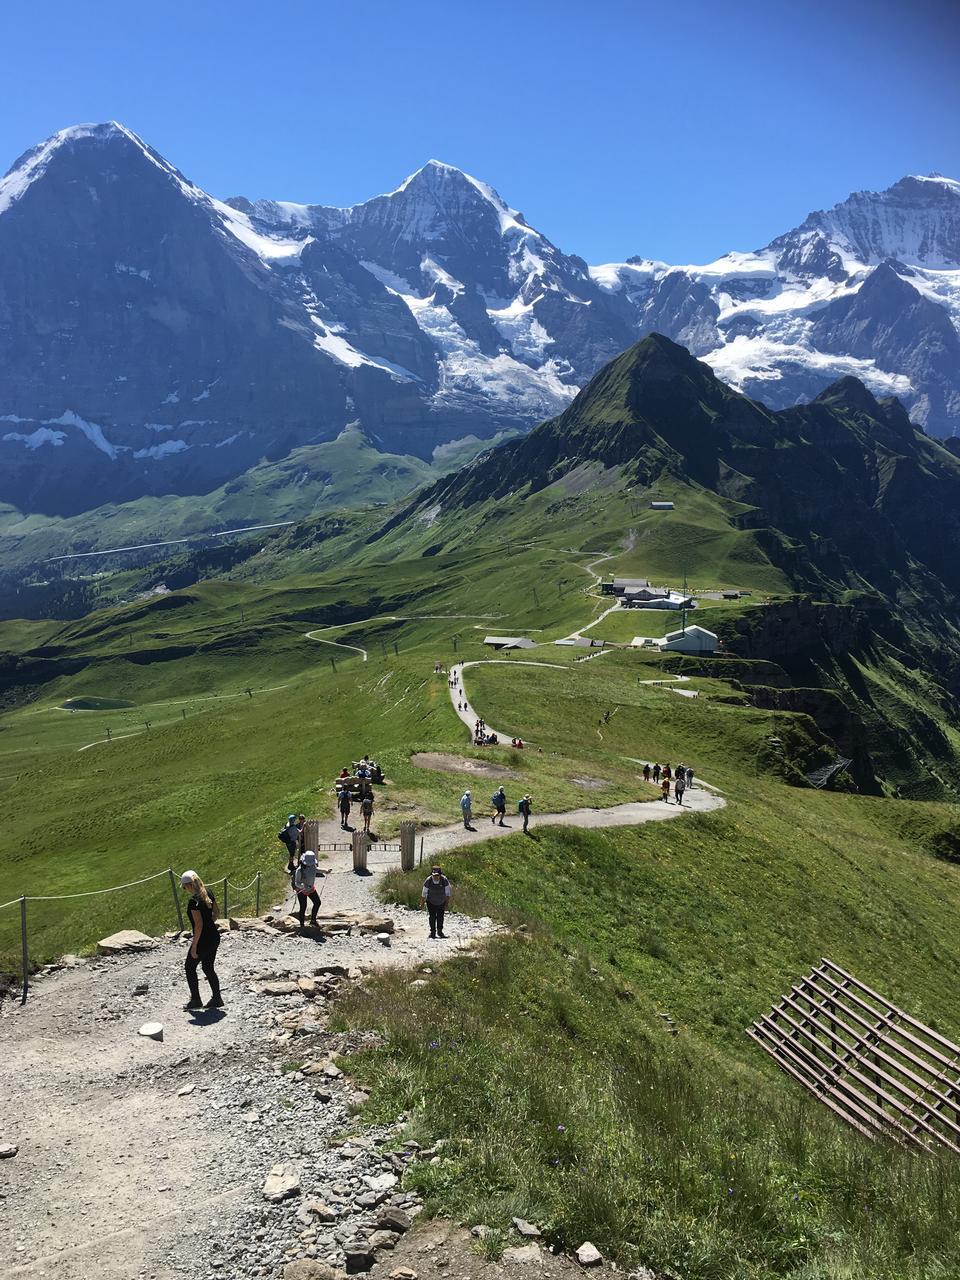 Famosas montañas Eiger, Monch y Jungfrau